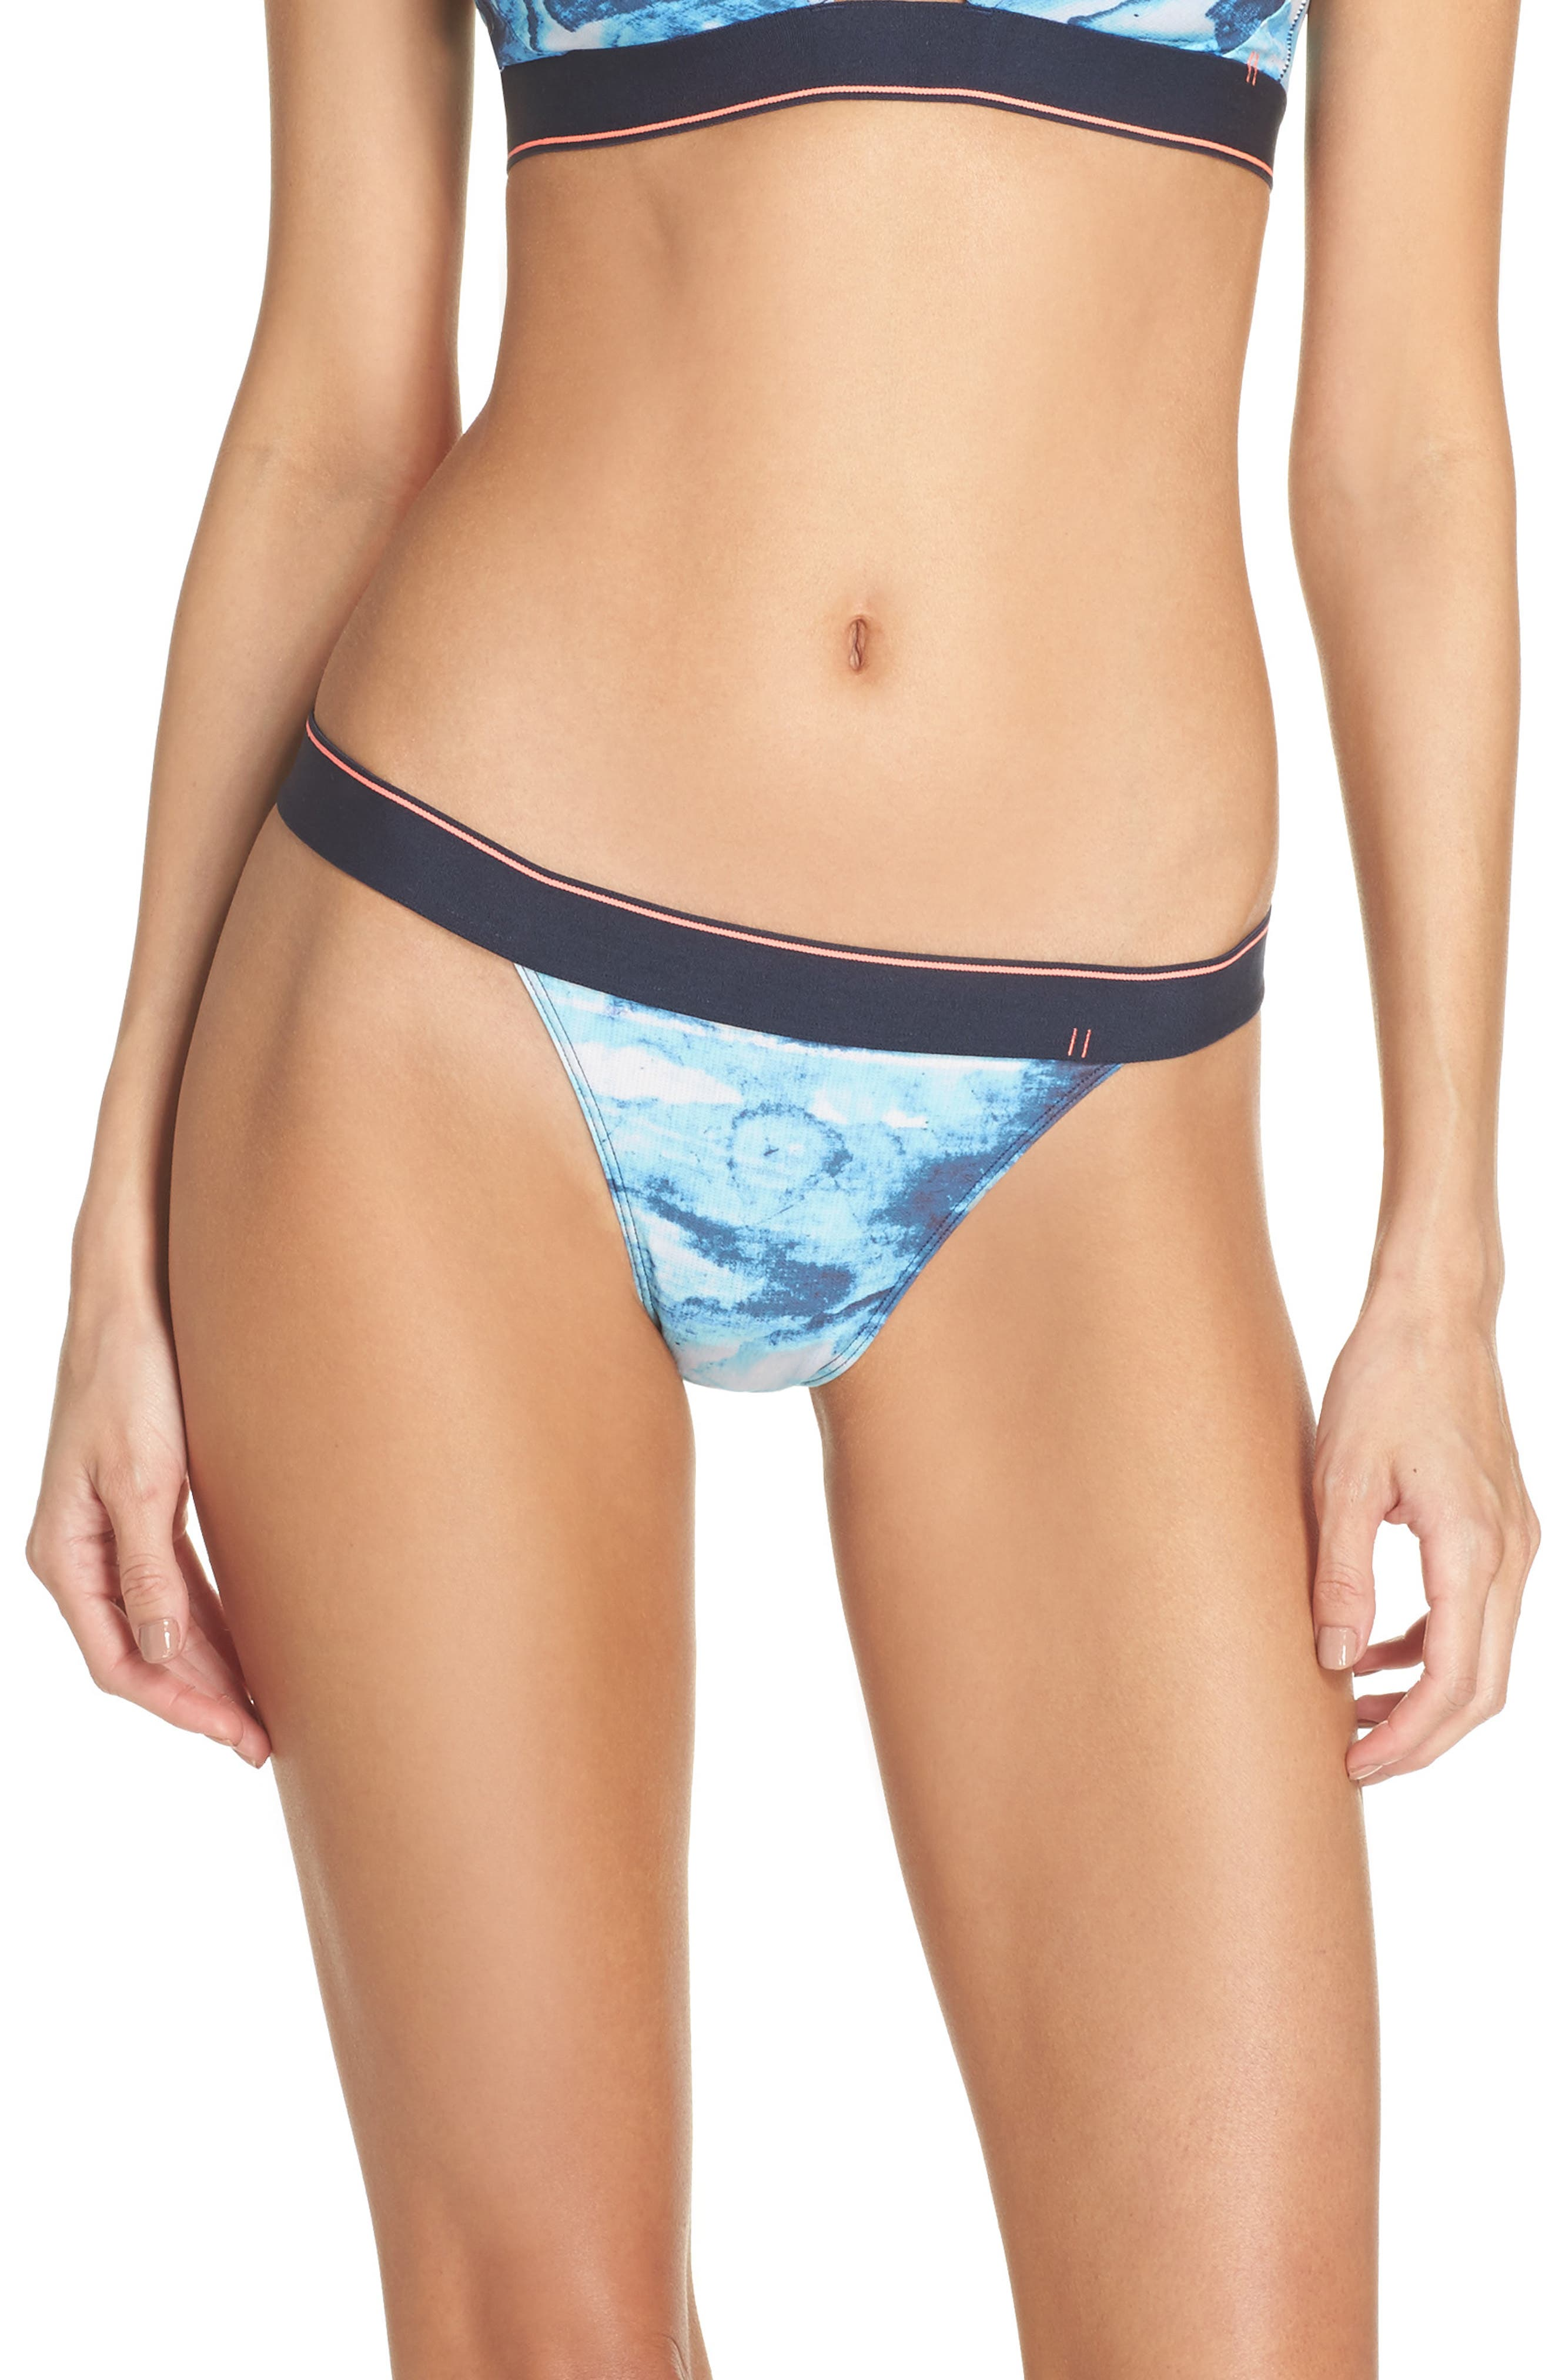 Tropic Storm Bikini,                         Main,                         color, NAVY